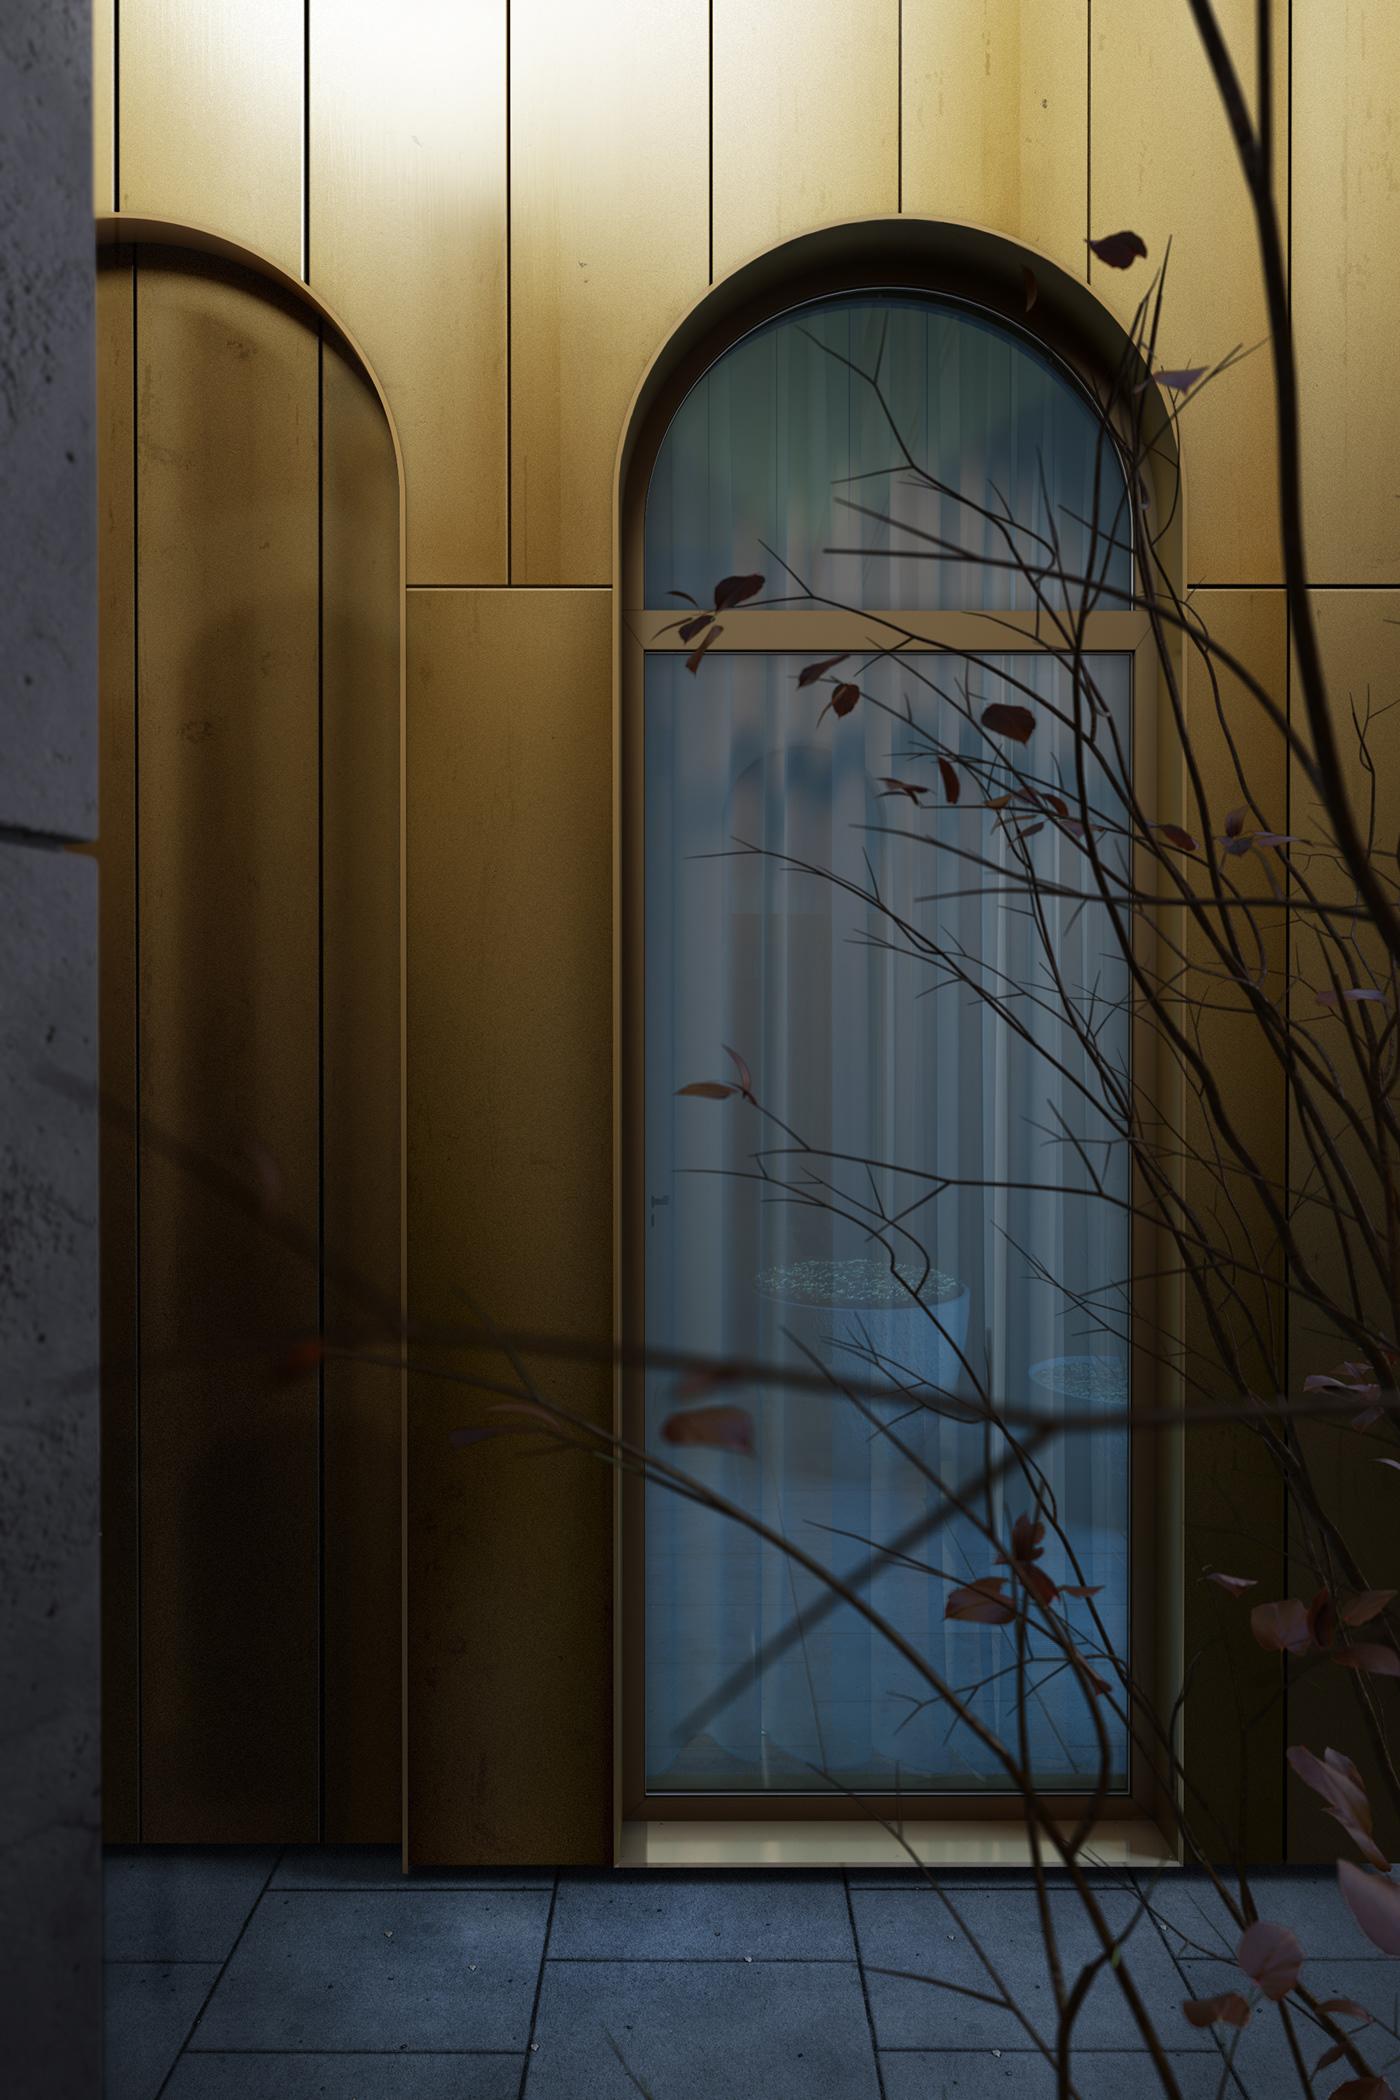 3ds max architecture BAK studio CGI corona renderer exterior Render Vizualization